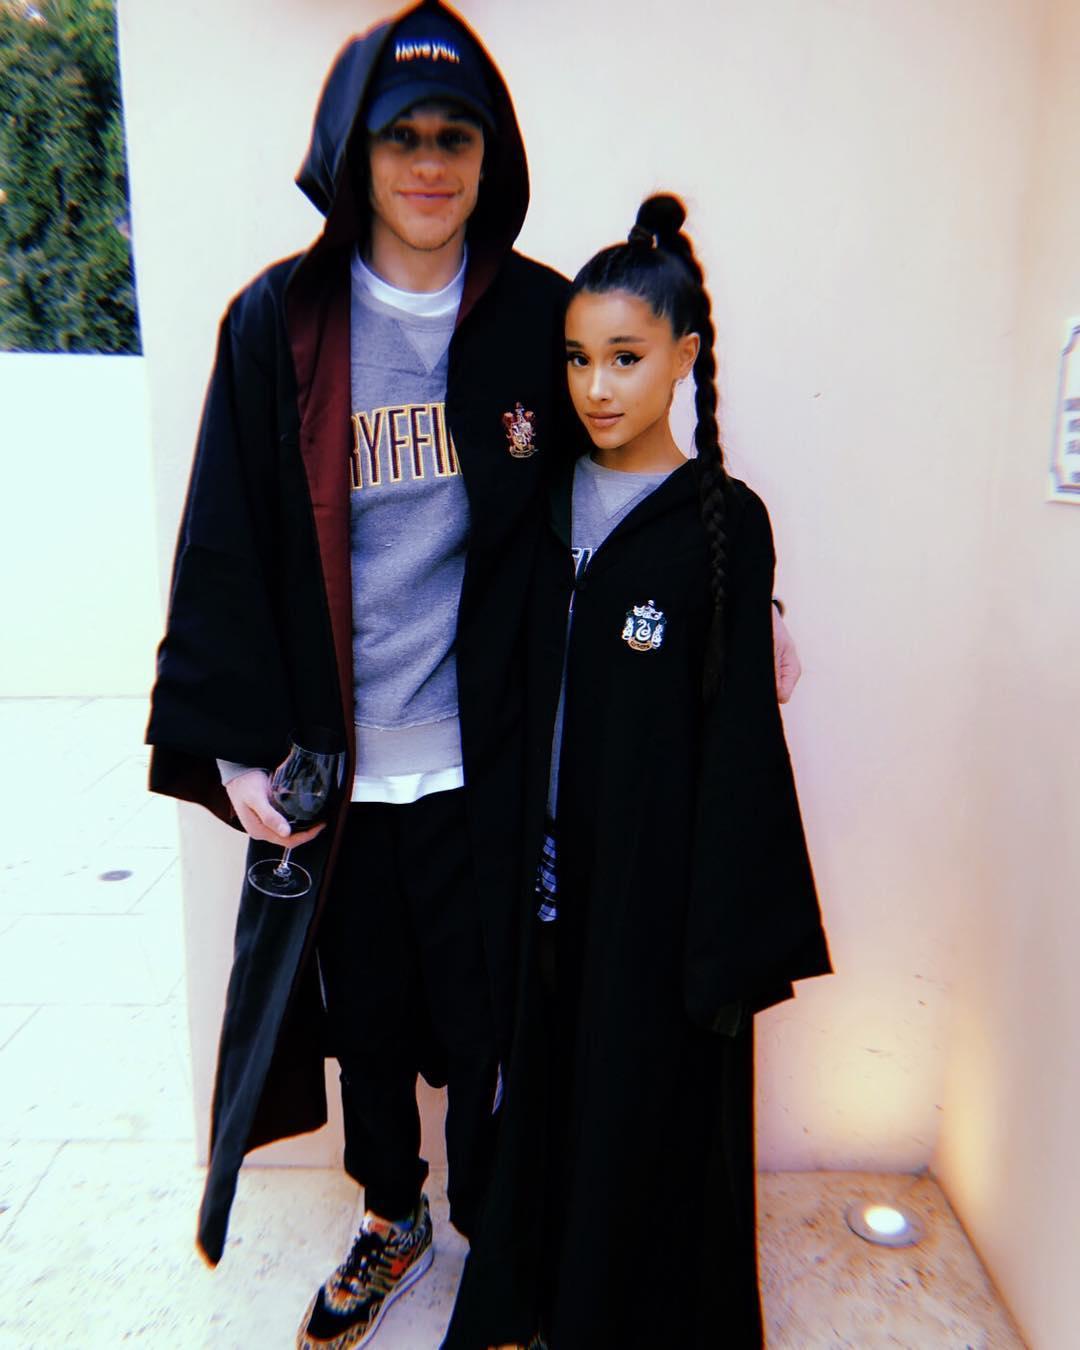 Ariana Grande and comedian Pete Davidson